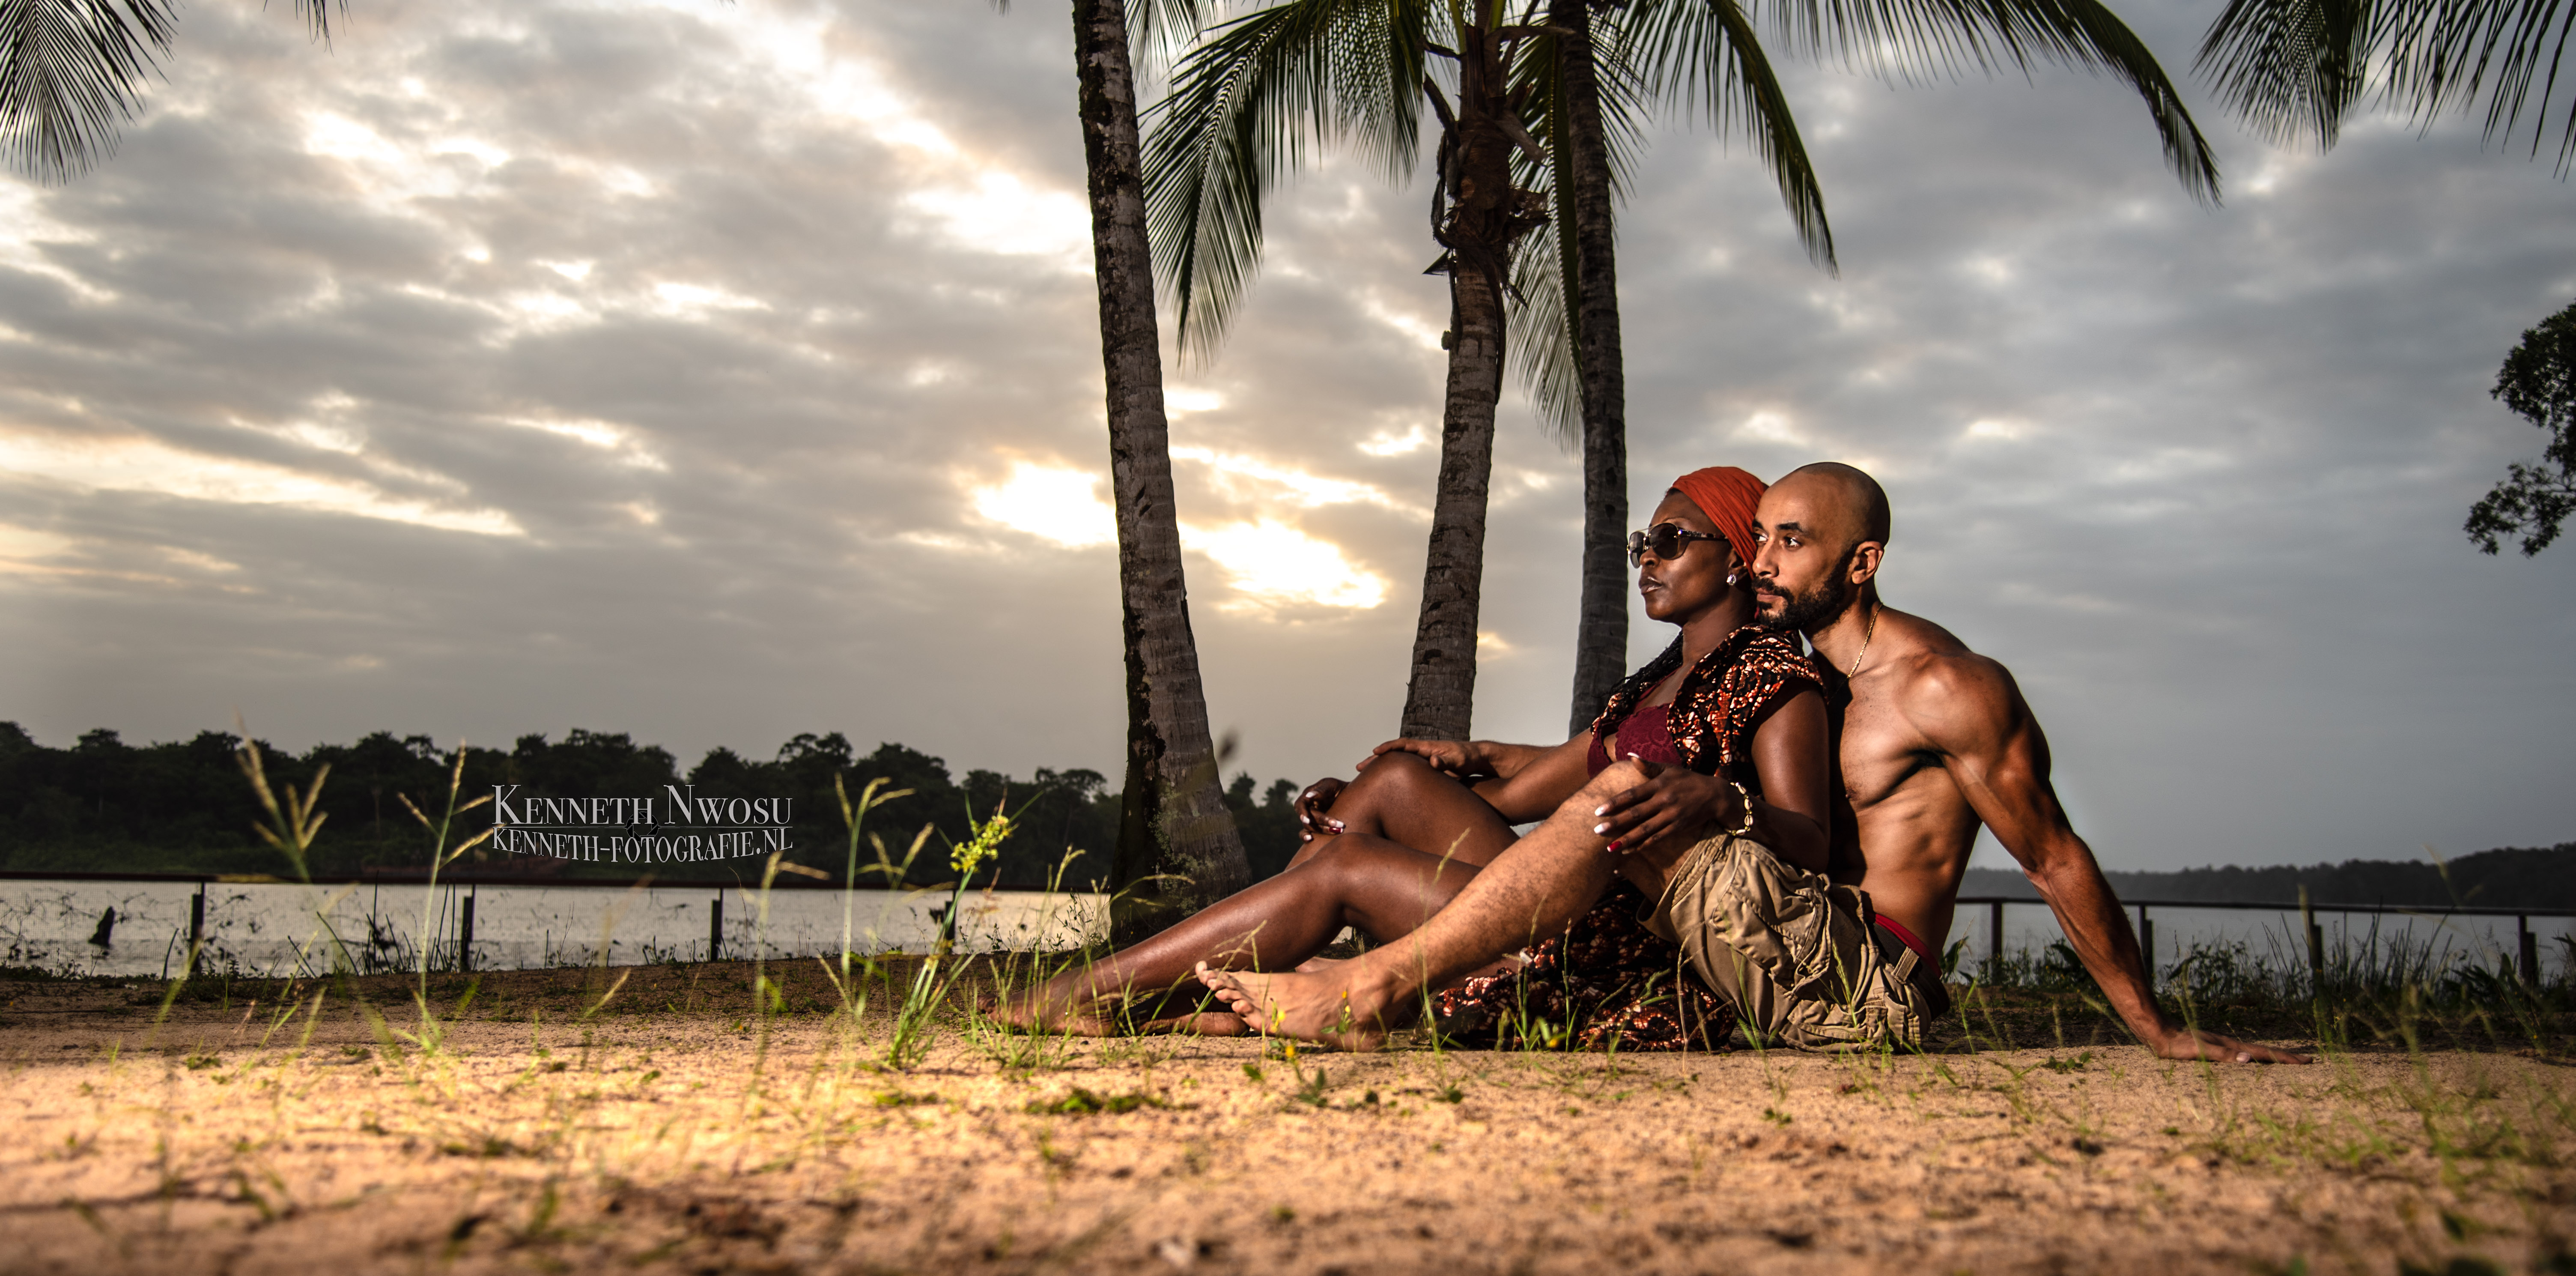 Overbridge Suriname fotoshoot 2